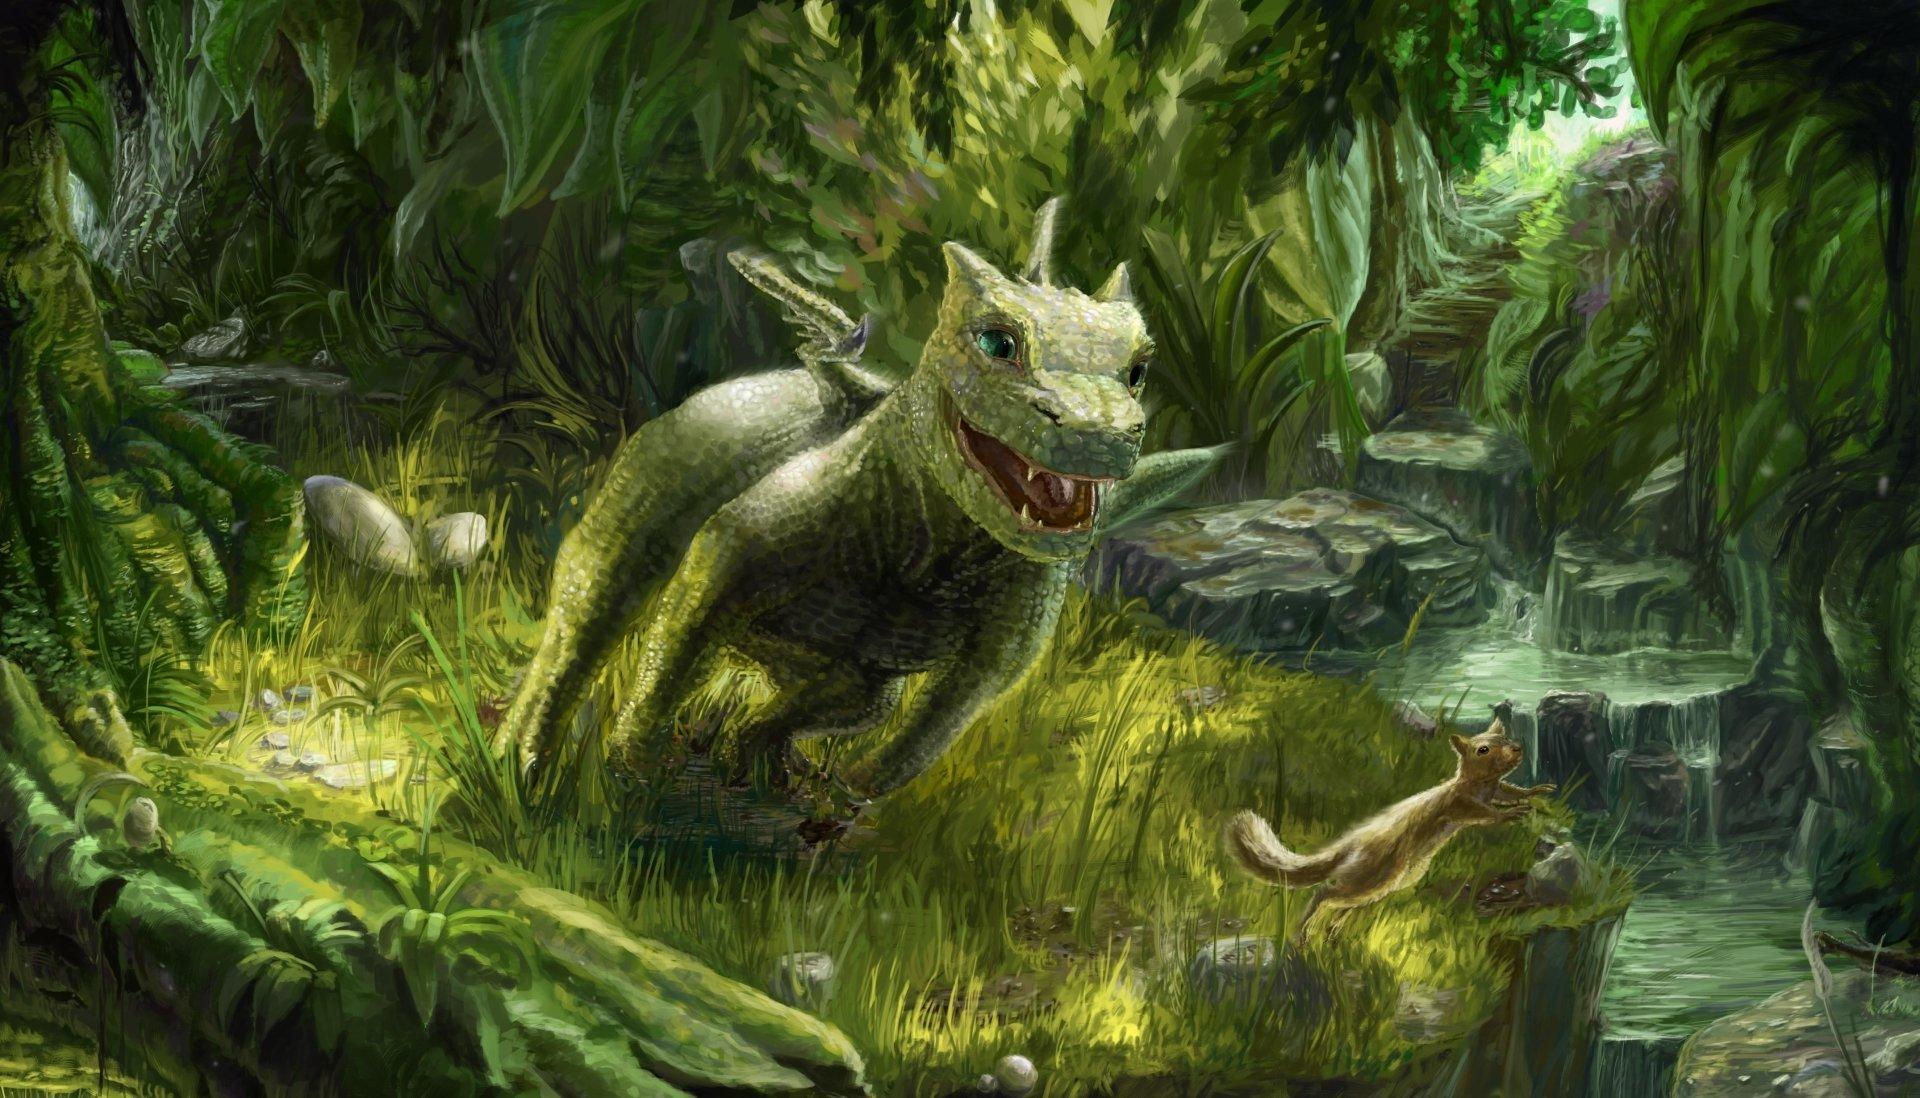 Dragon 4k Ultra HD Wallpaper